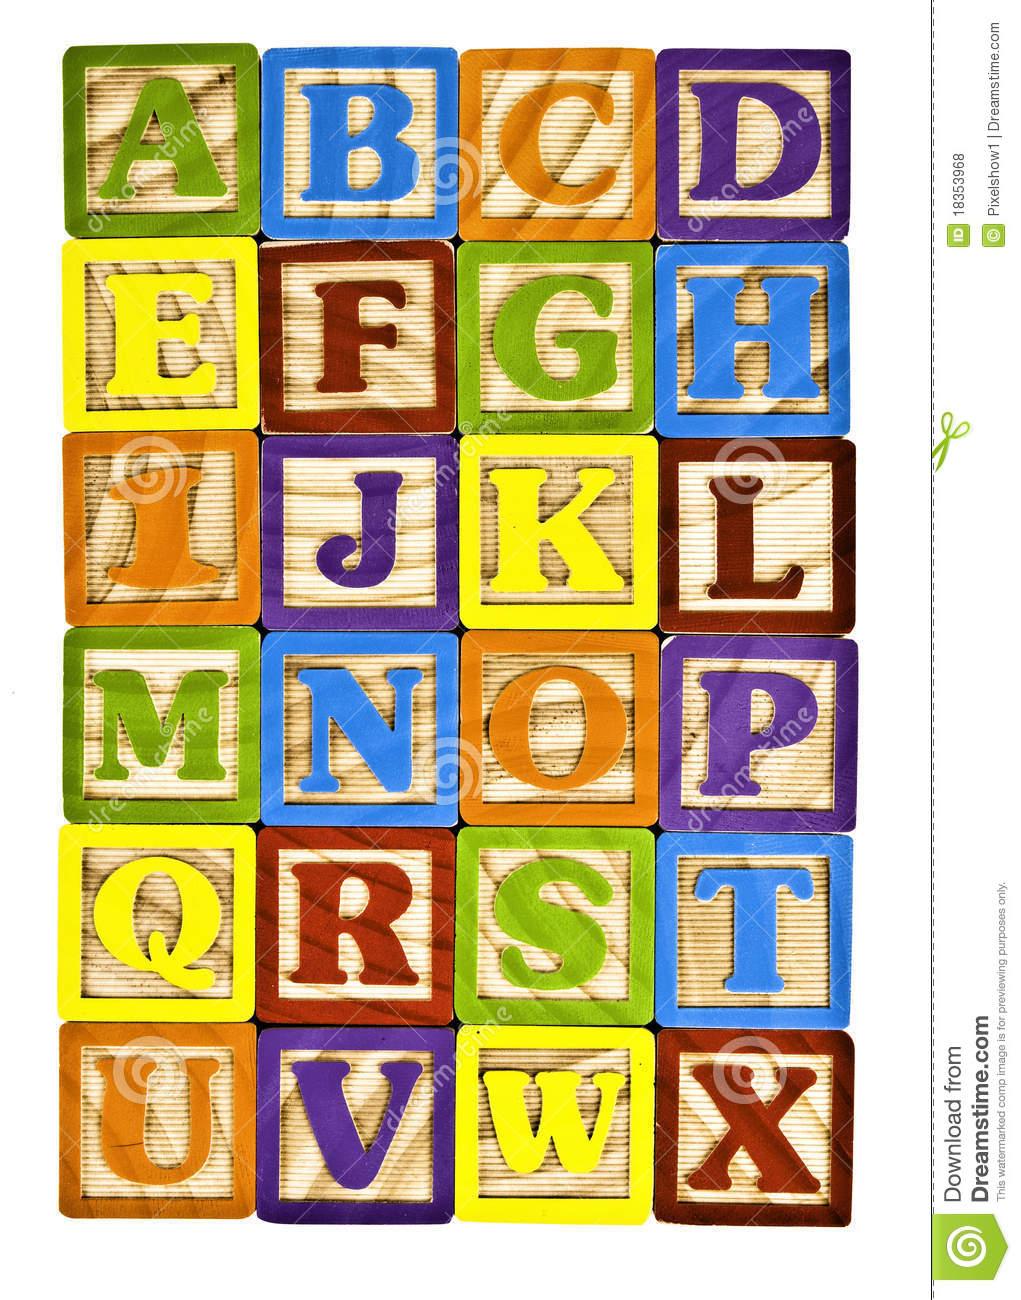 Block letter clipart free svg transparent library Alphabet Block Letters Clipart - Clipart Kid svg transparent library